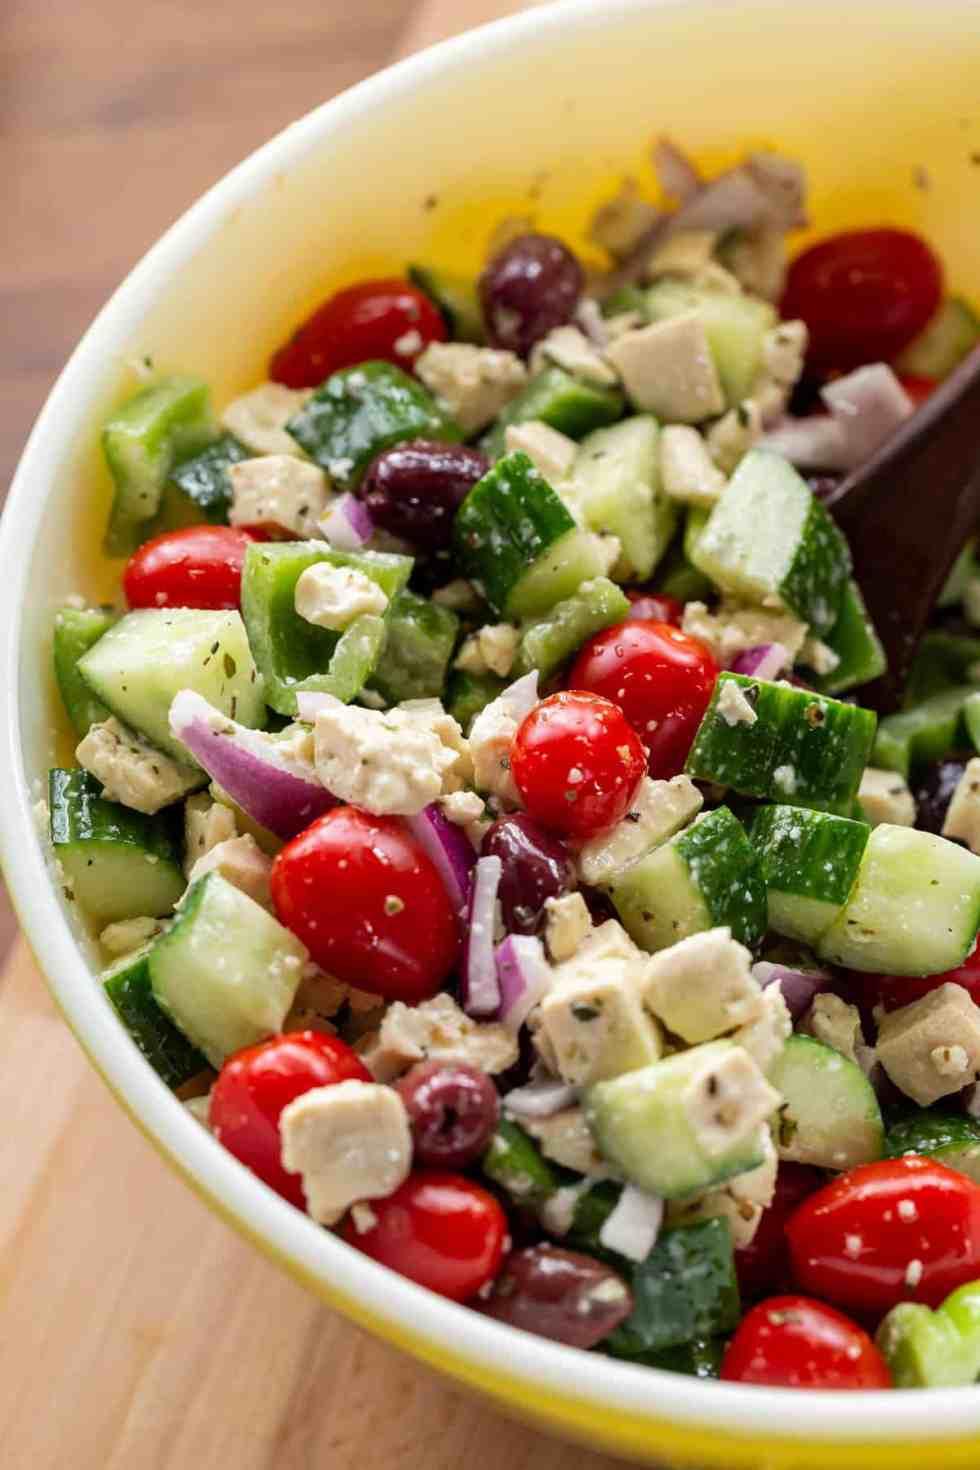 Prepared vegan Greek salad in a large yellow Pyrex serving bowl.